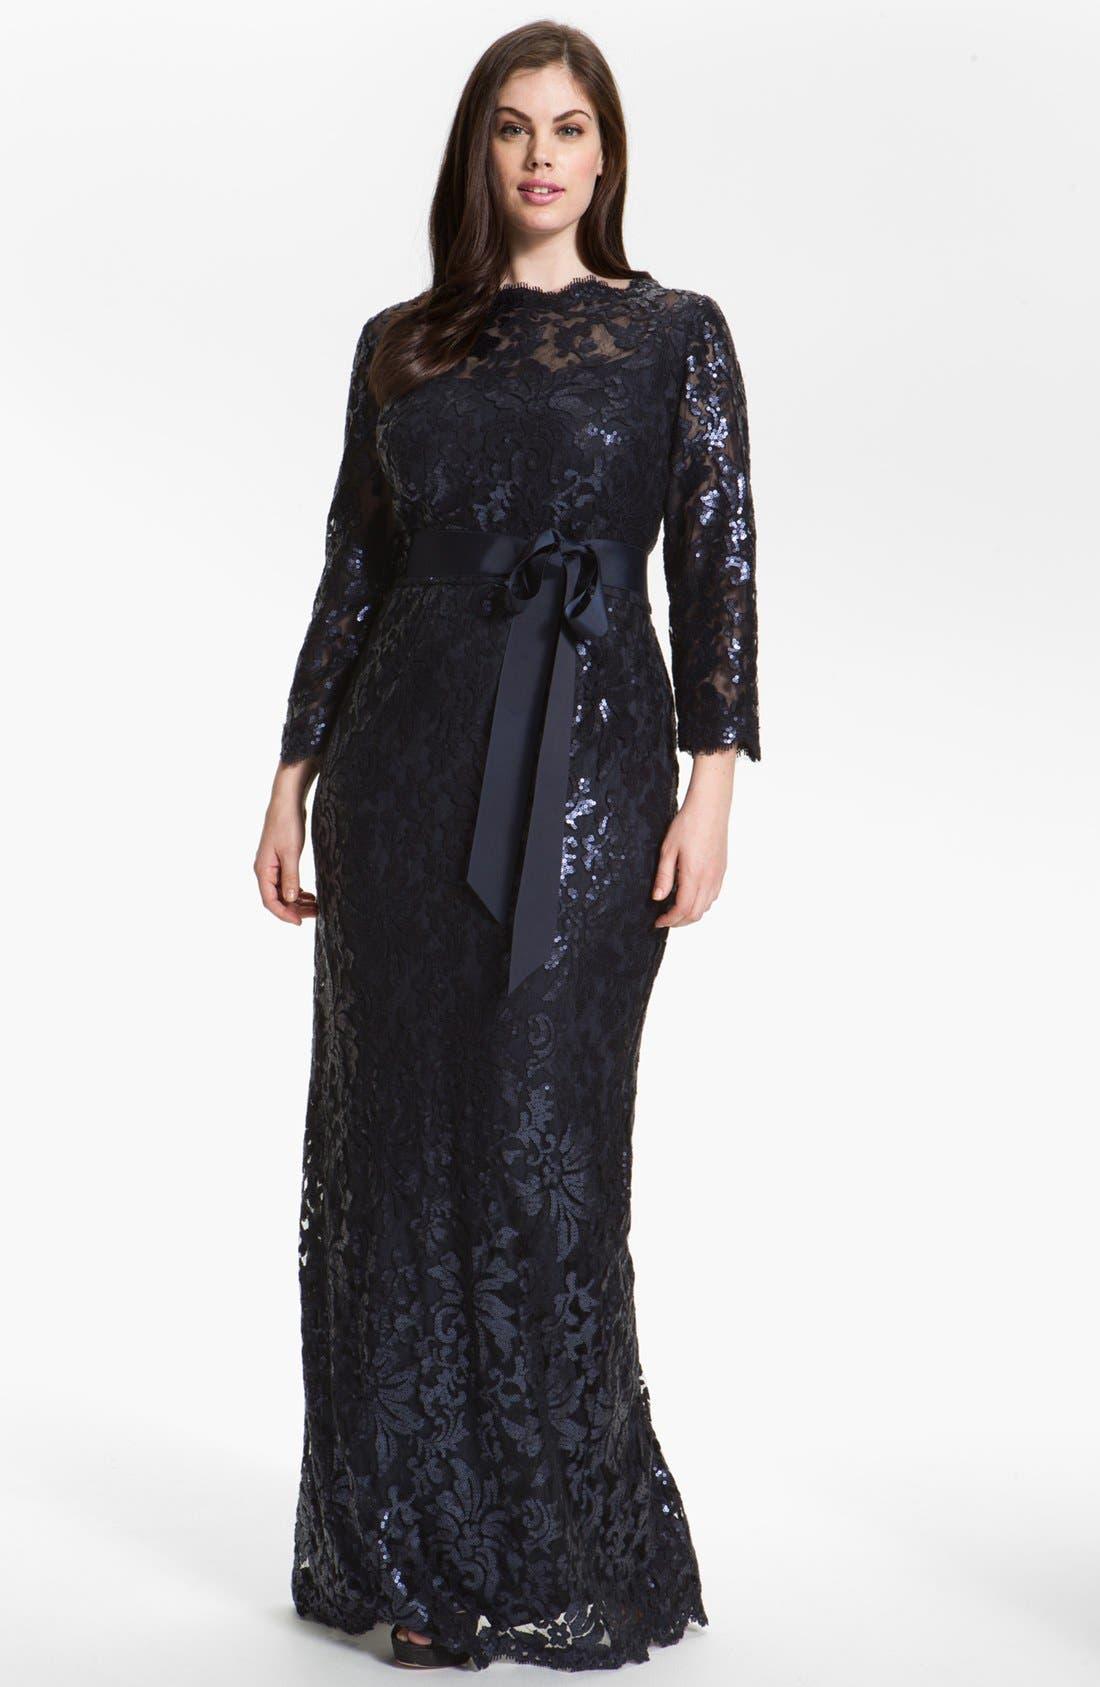 Alternate Image 1 Selected - Tadashi Shoji Embellished Lace Column Gown (Plus Size) (Nordstrom Exclusive)